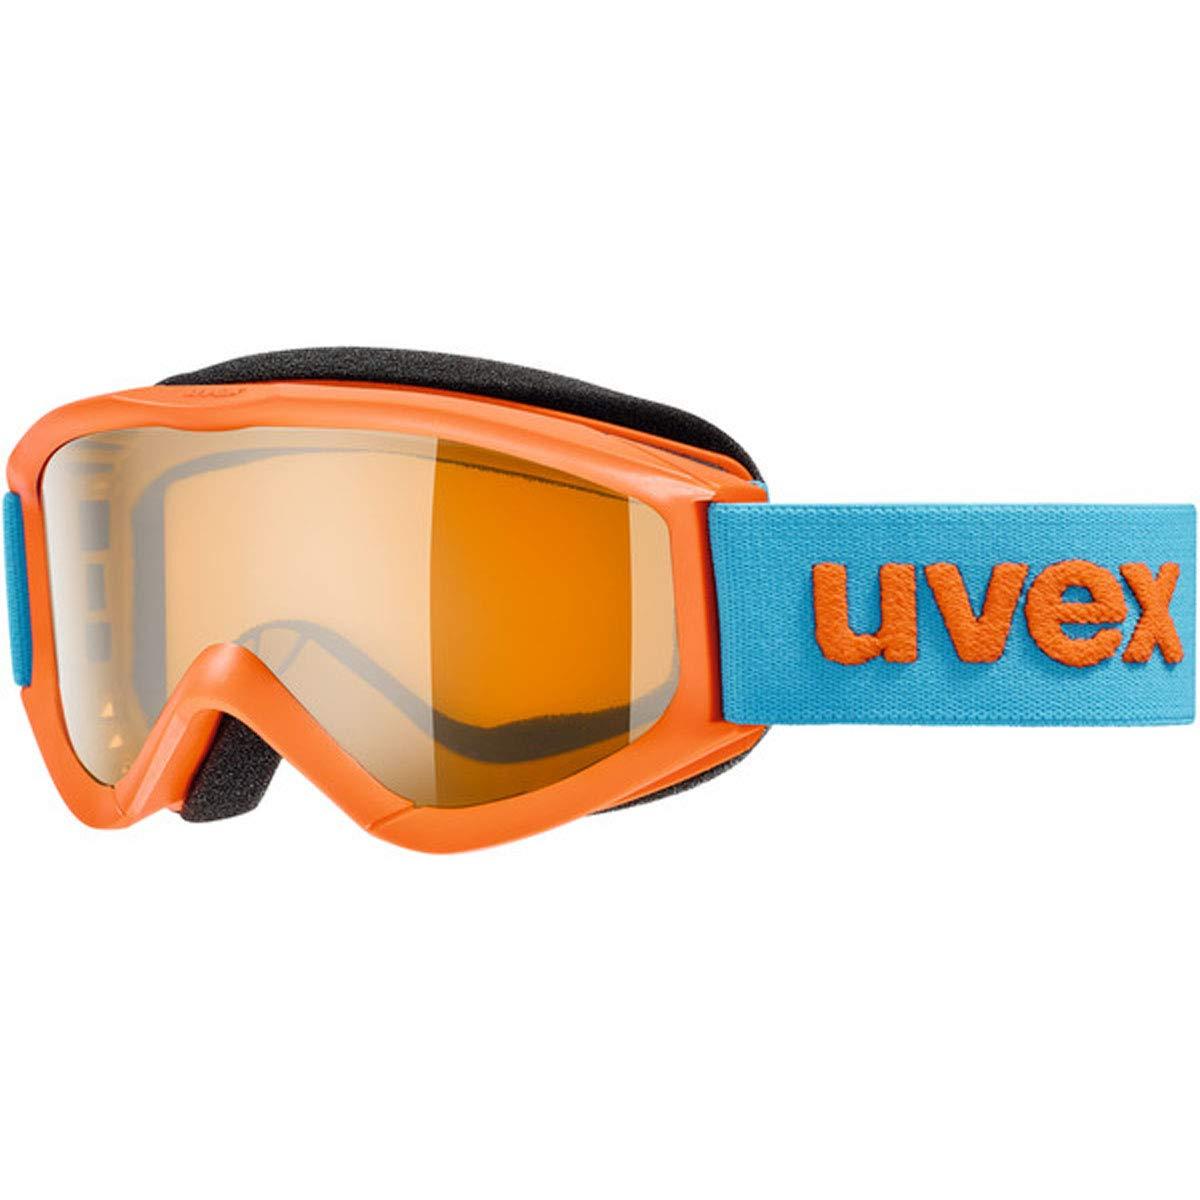 8a28ccd265be Uvex Kids Speedy Pro Ski Goggles  Amazon.co.uk  Sports   Outdoors